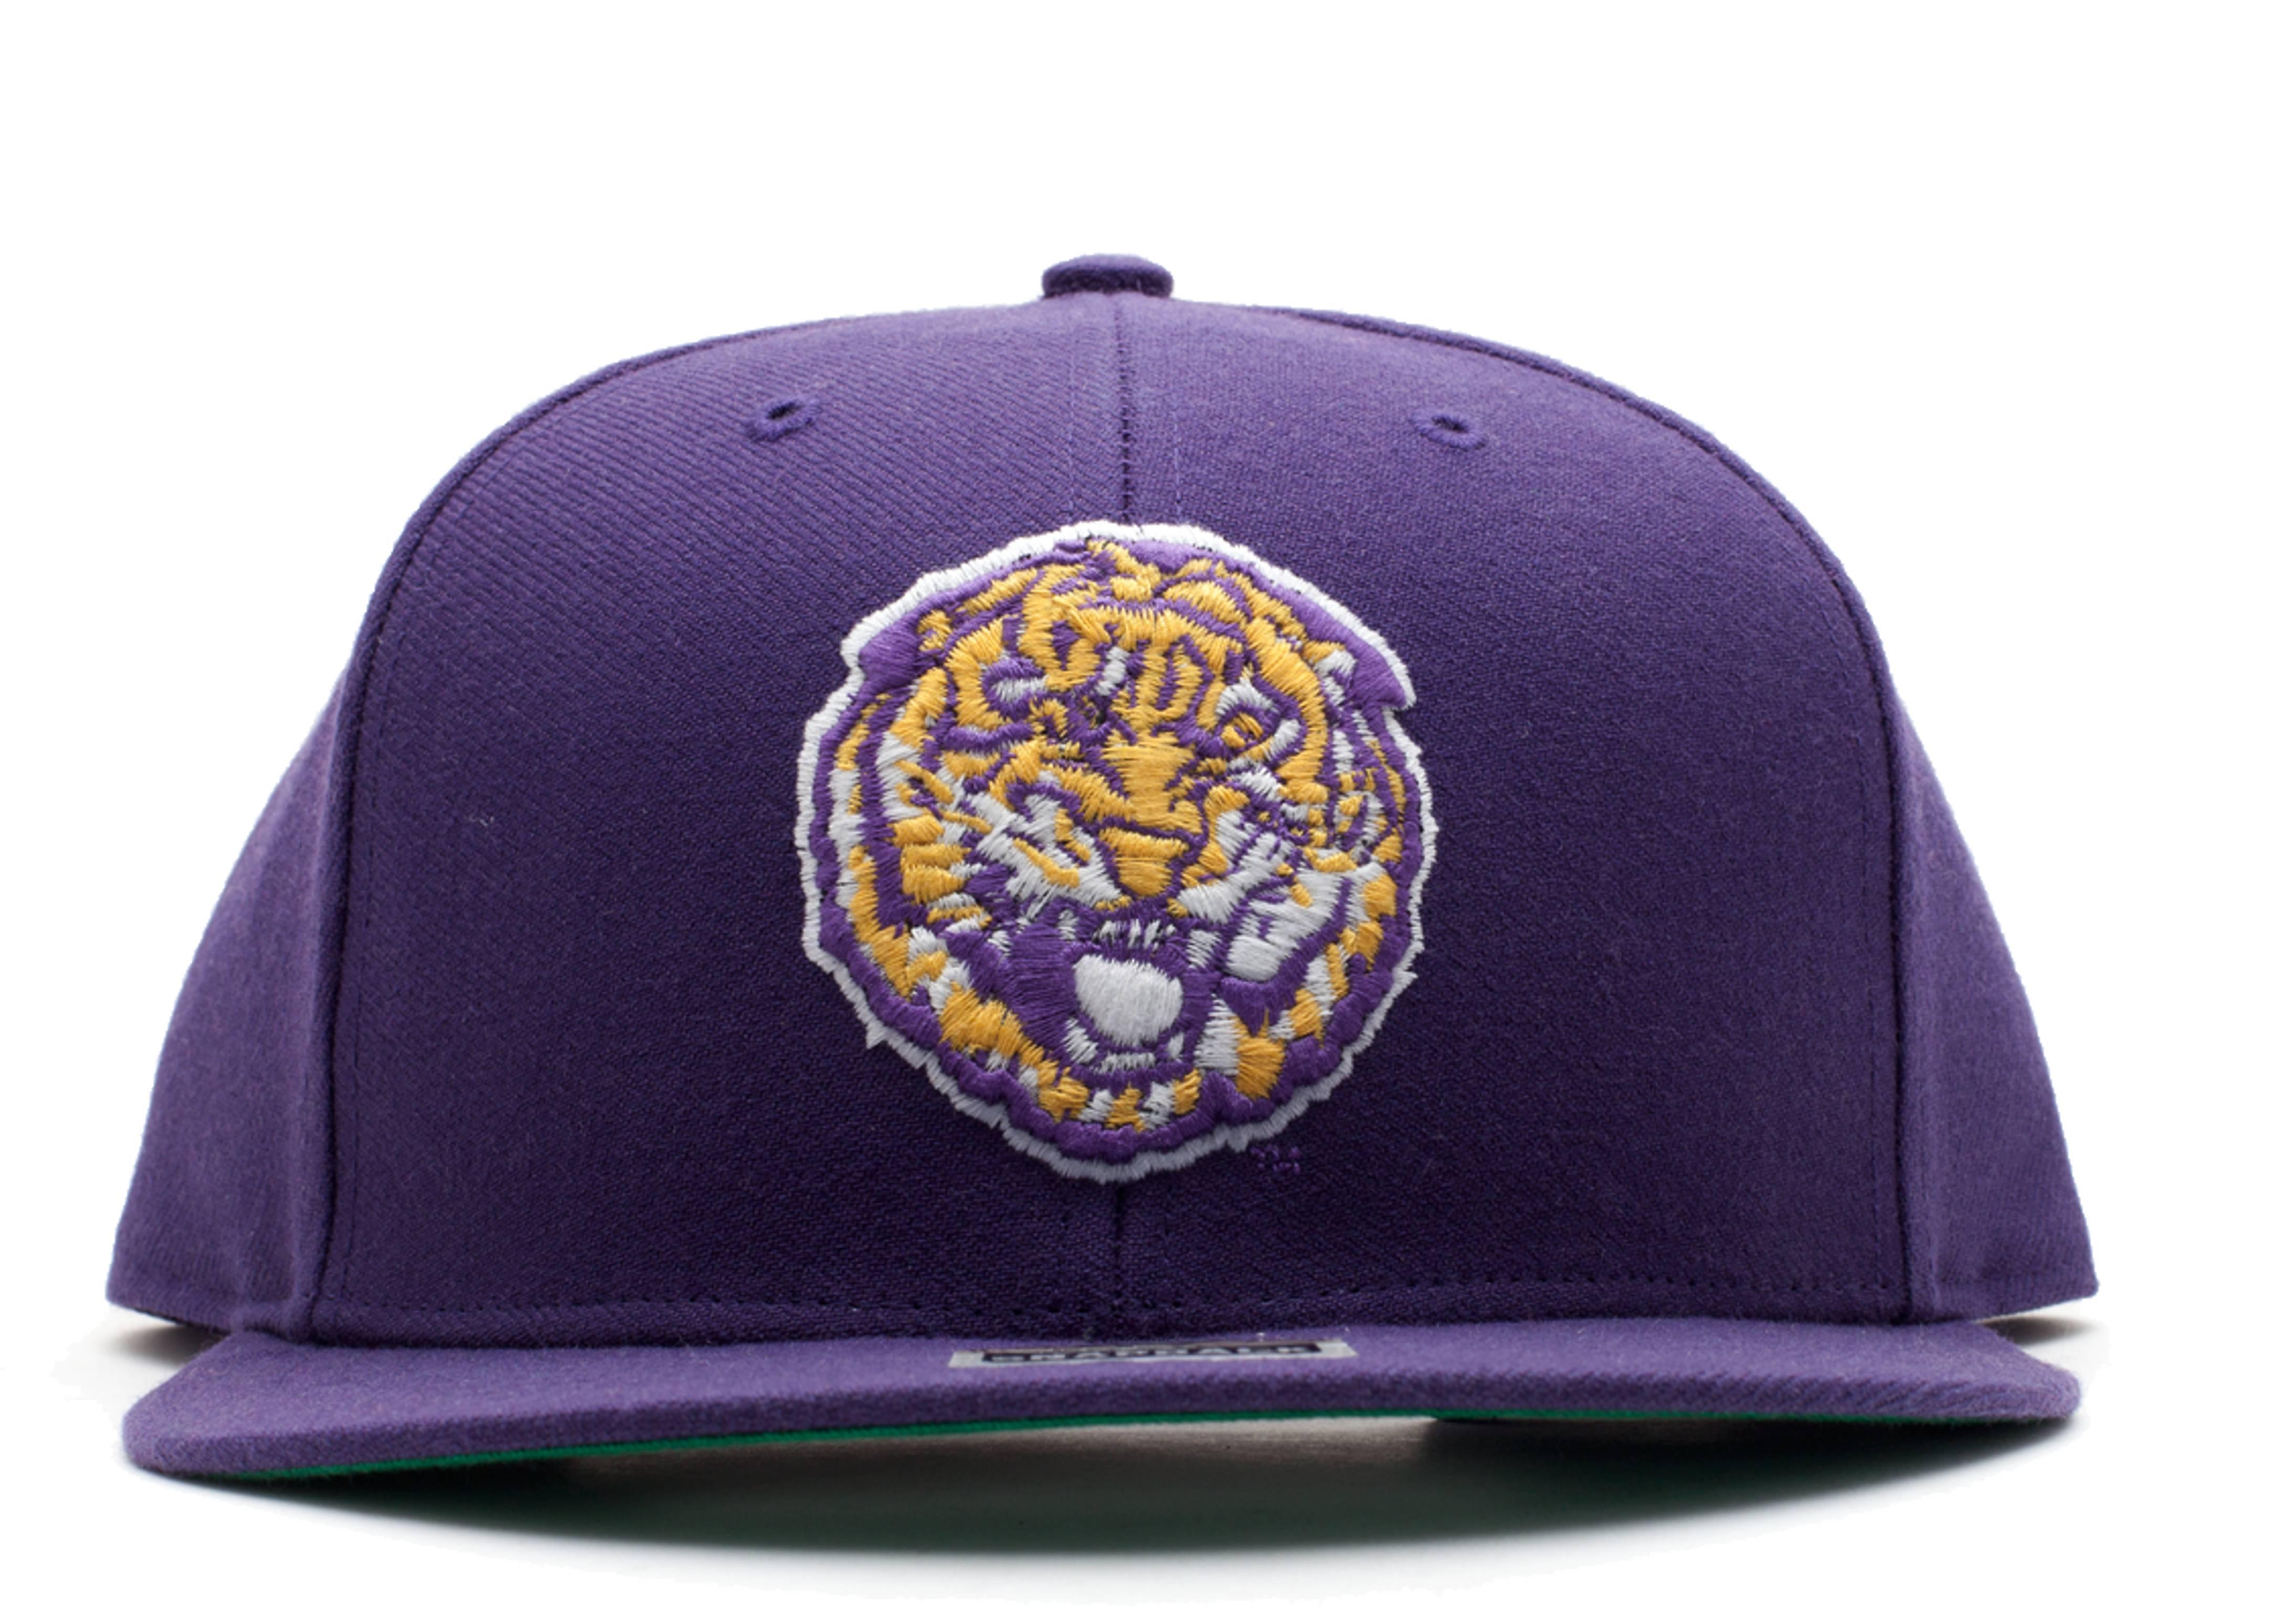 lsu tigers snap-back